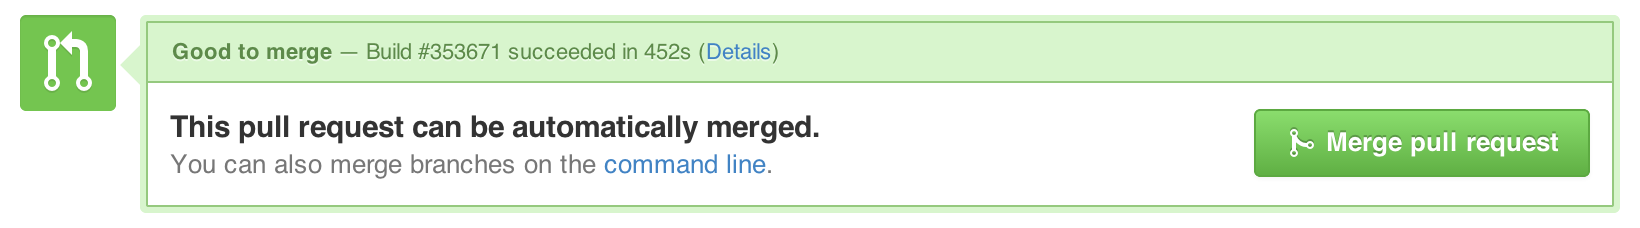 New merge button